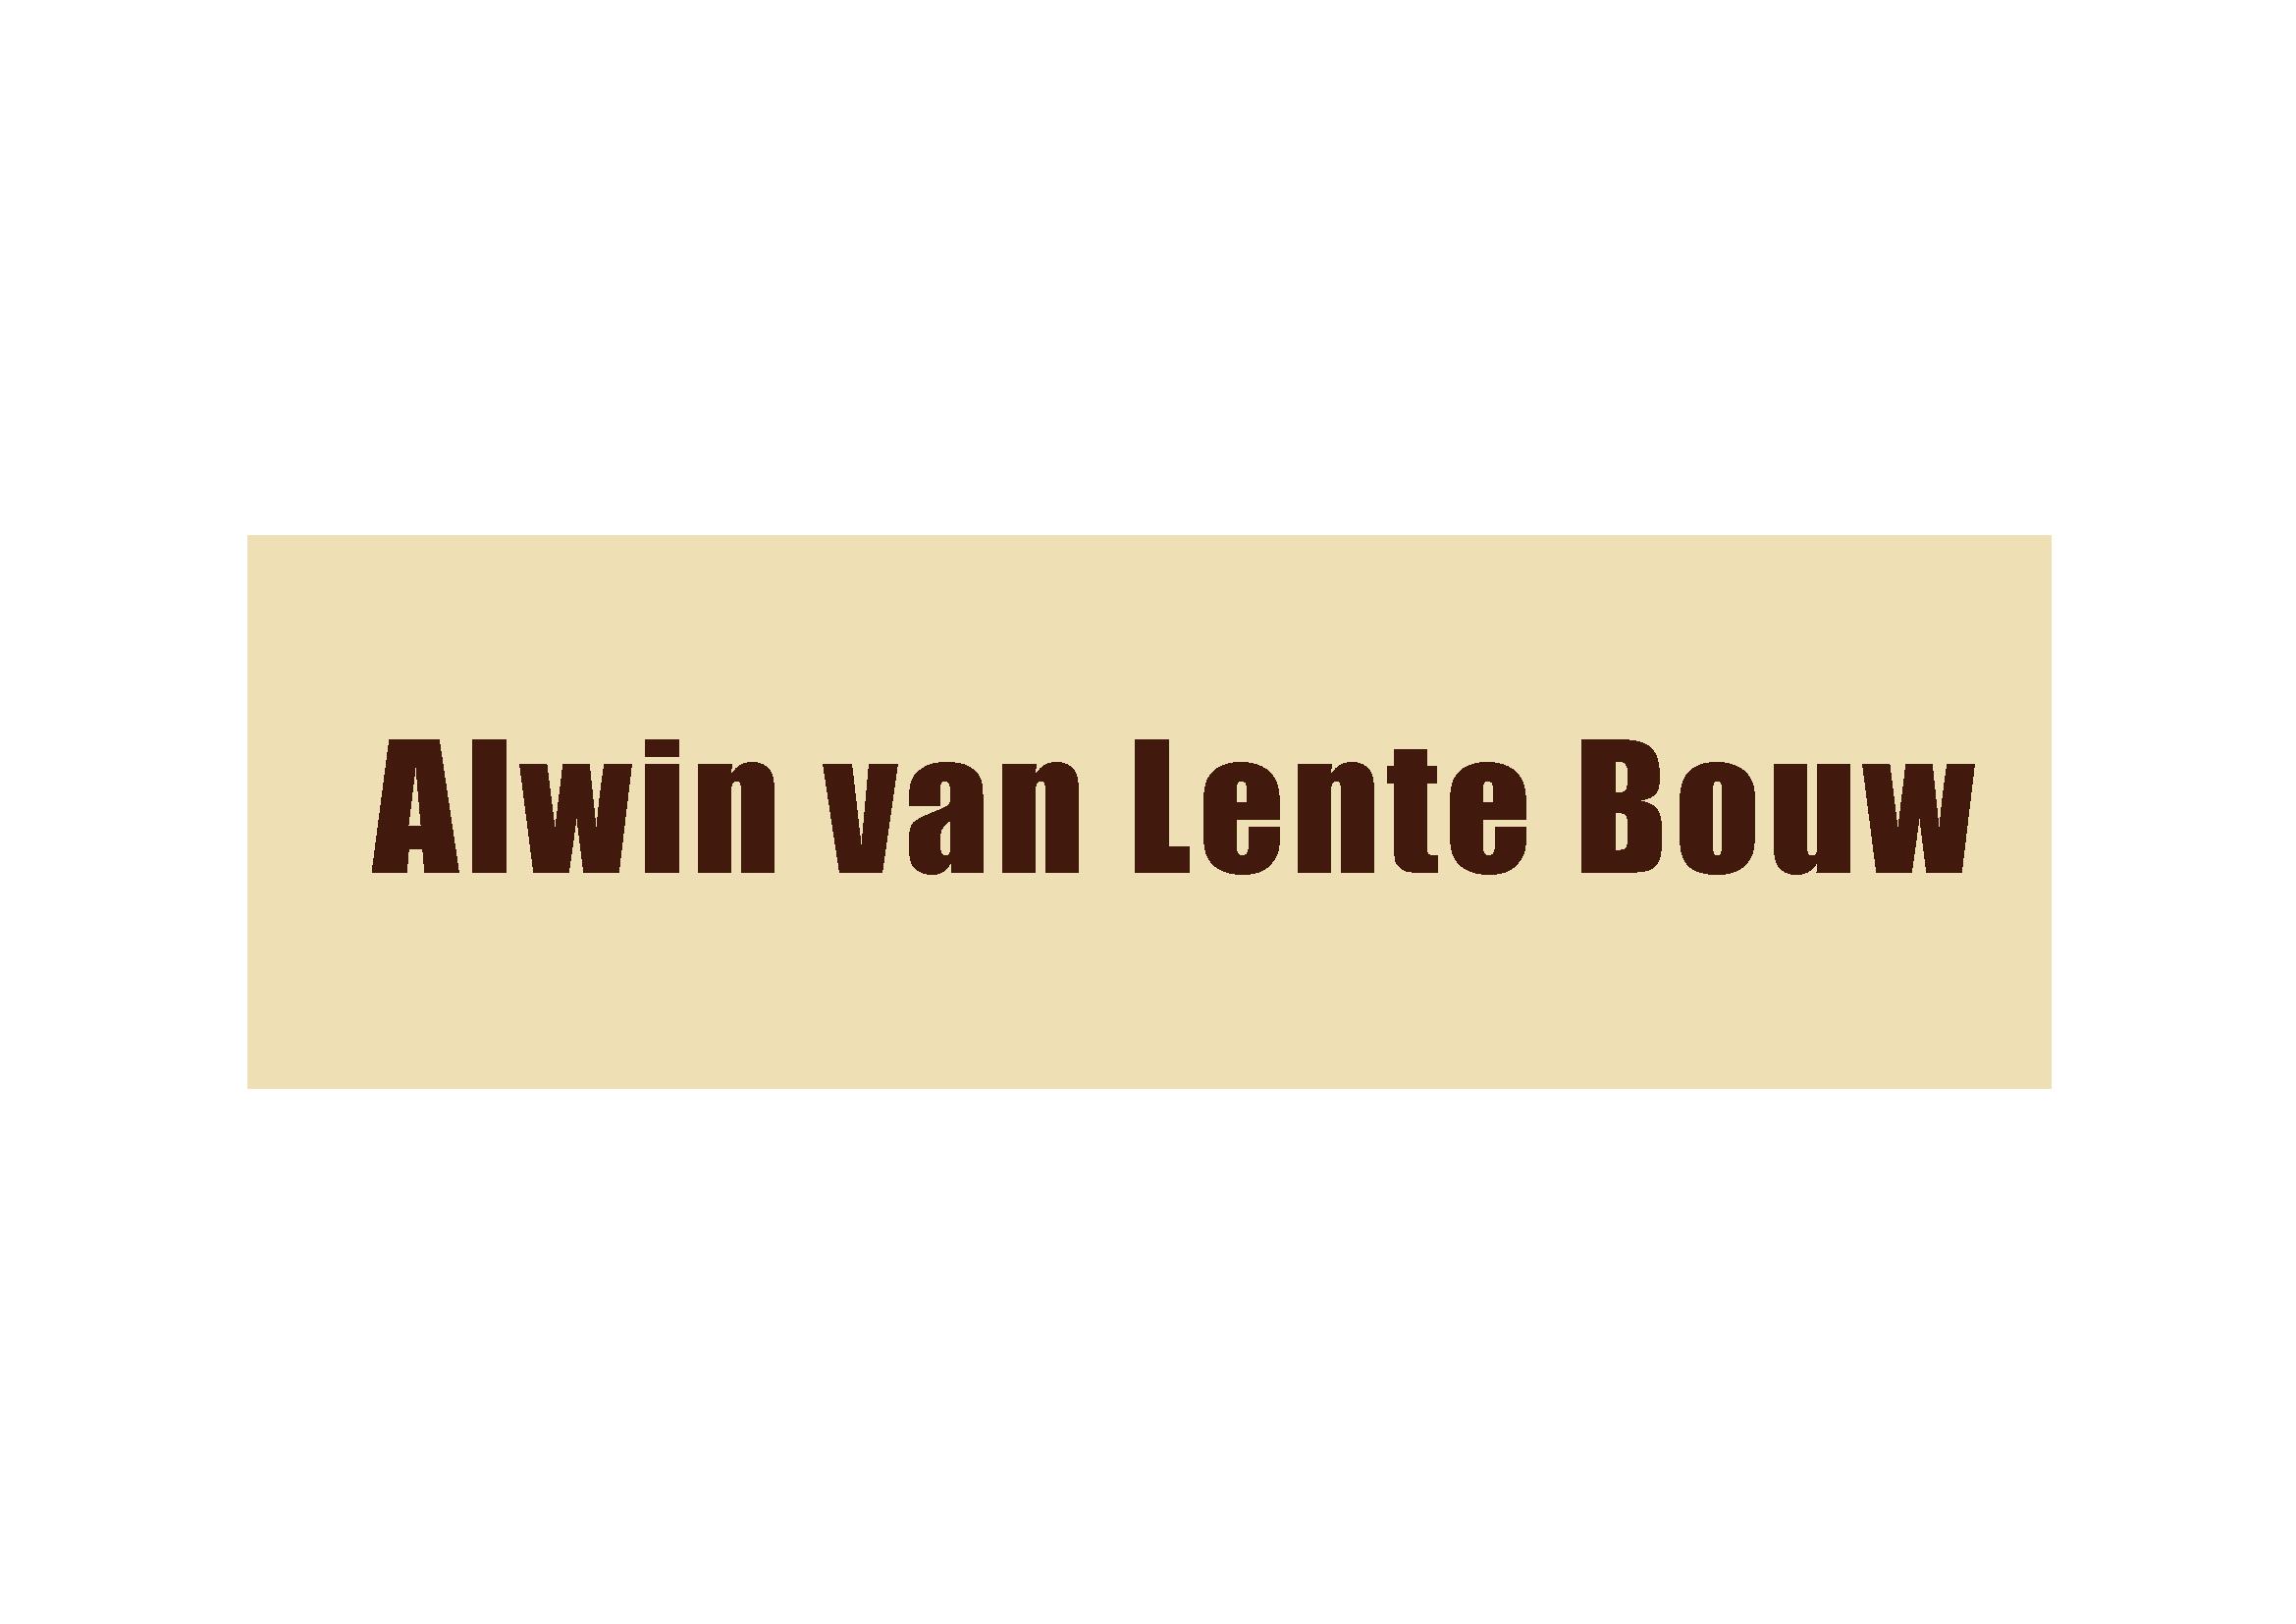 08 AlwinvanLente - logo